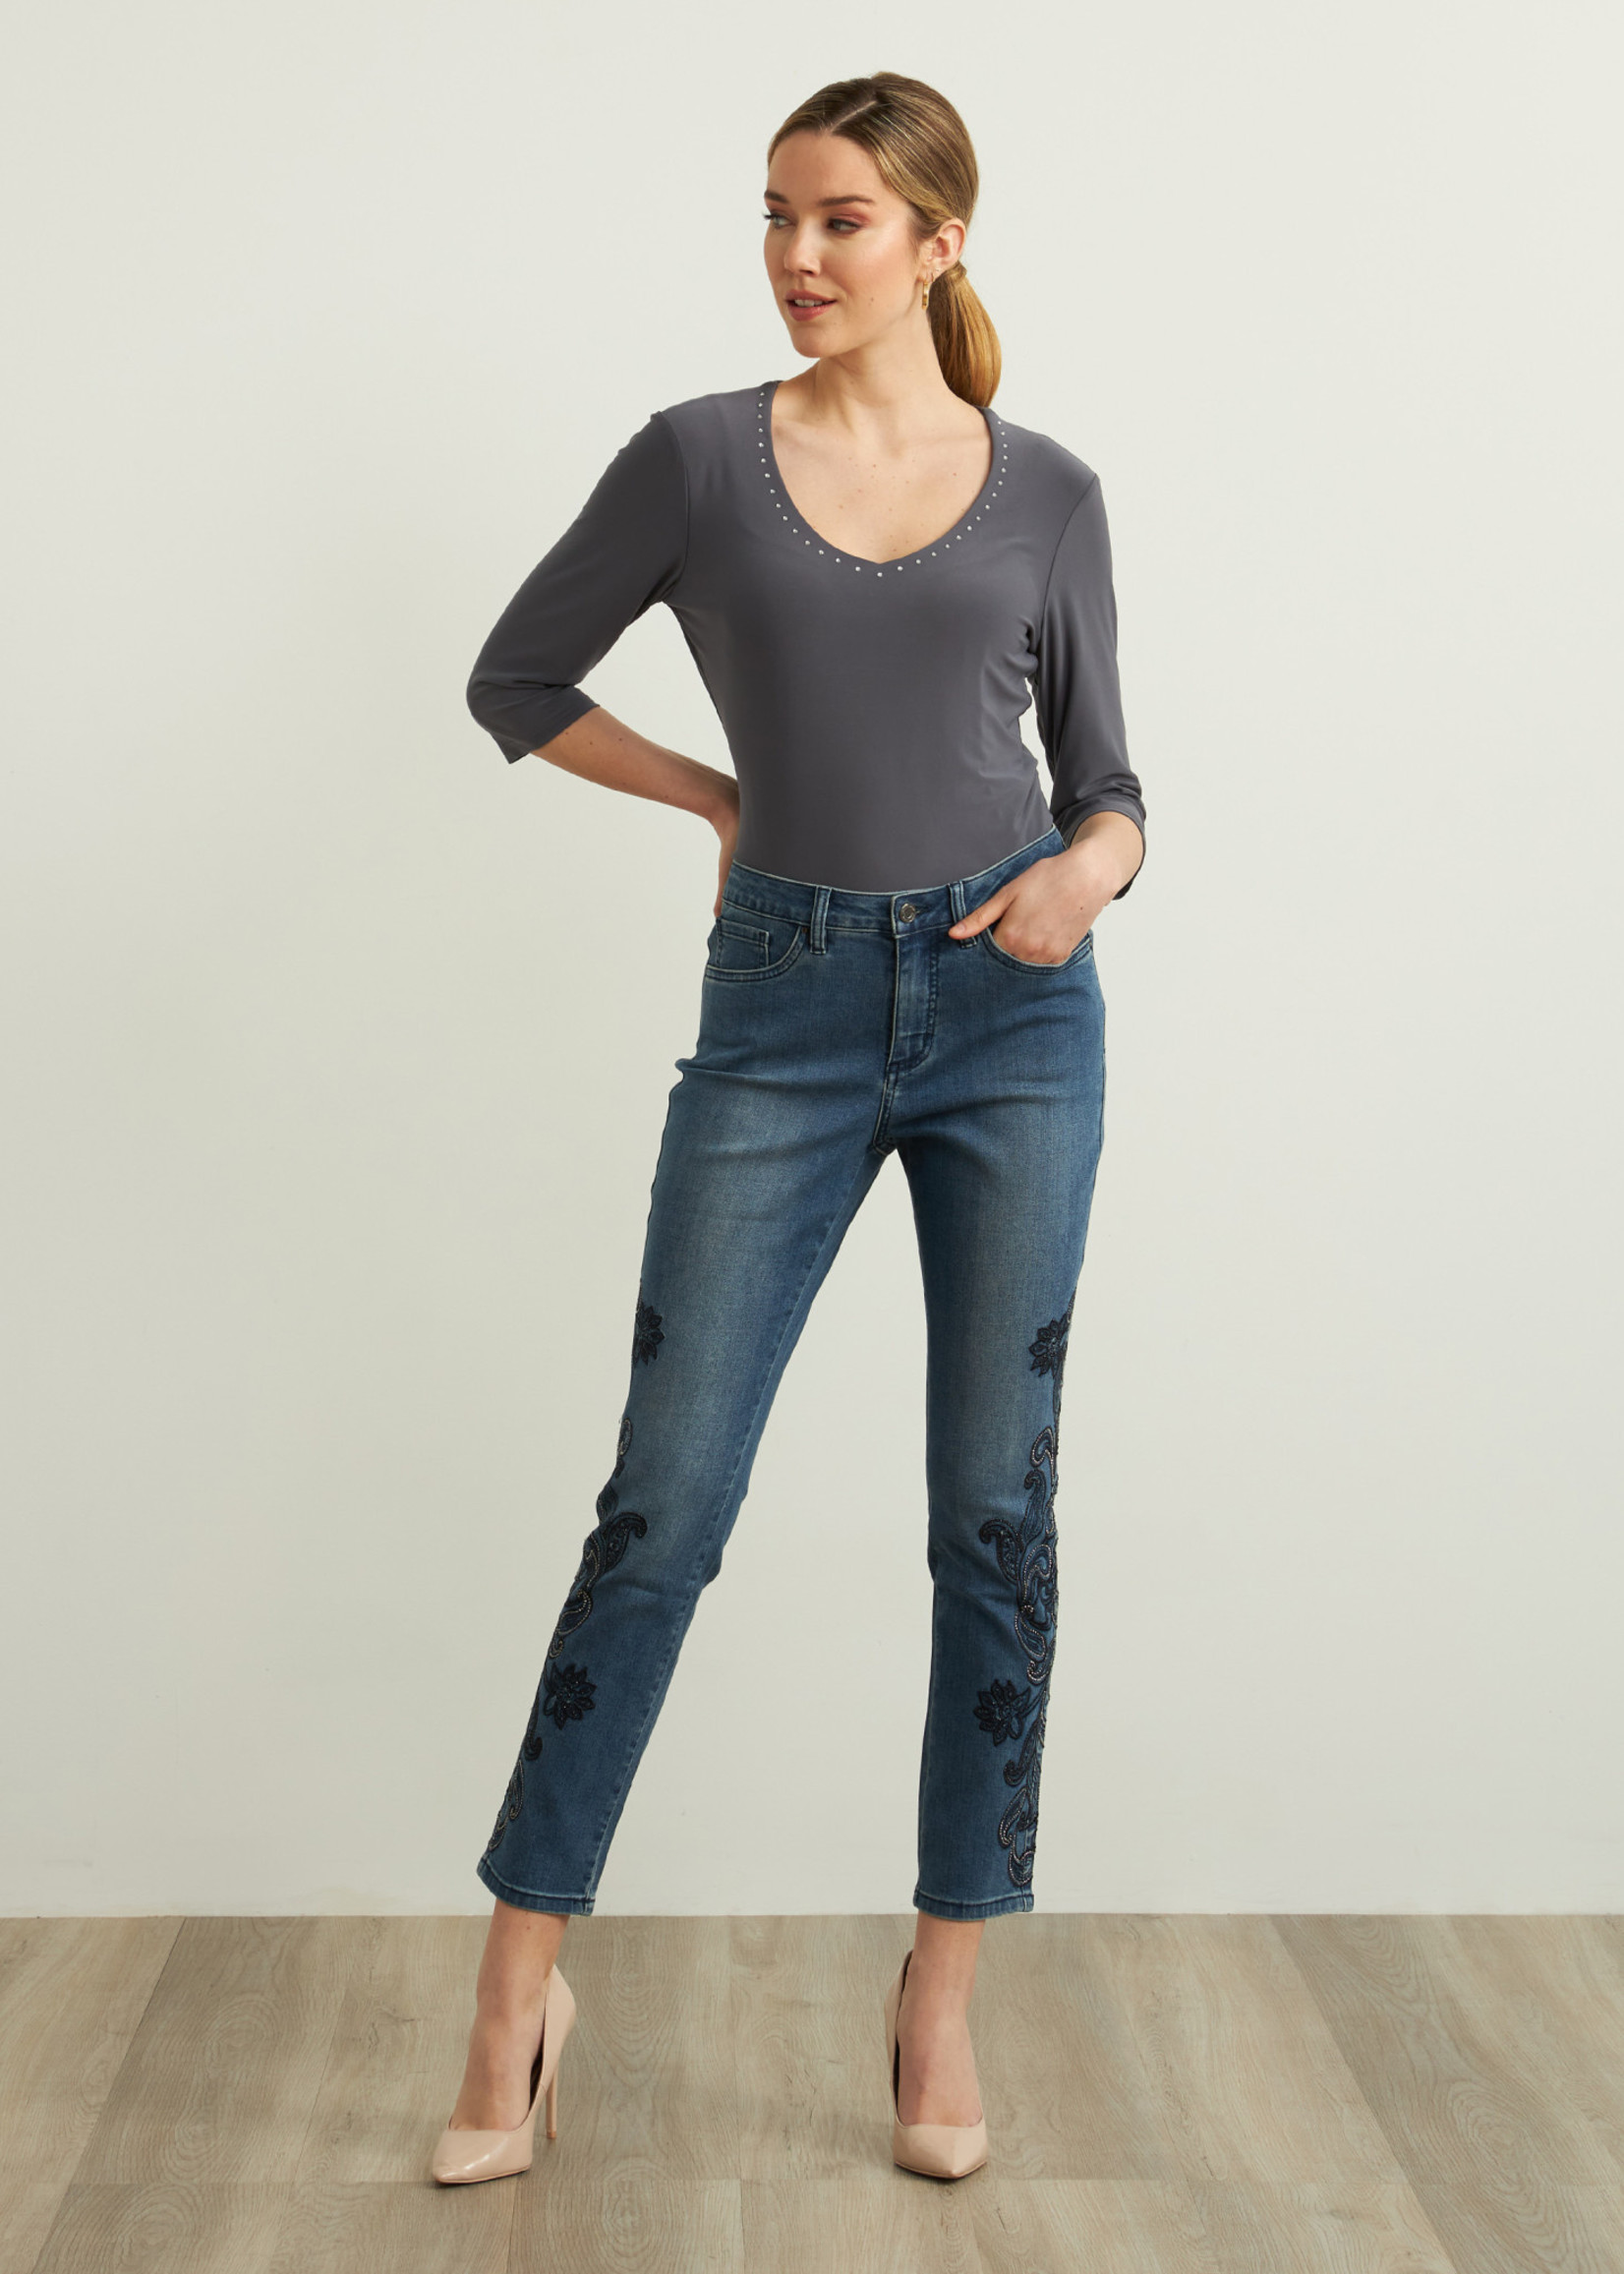 Joseph Ribkoff Joseph Ribkoff Jeans w/Beaded Embroidery